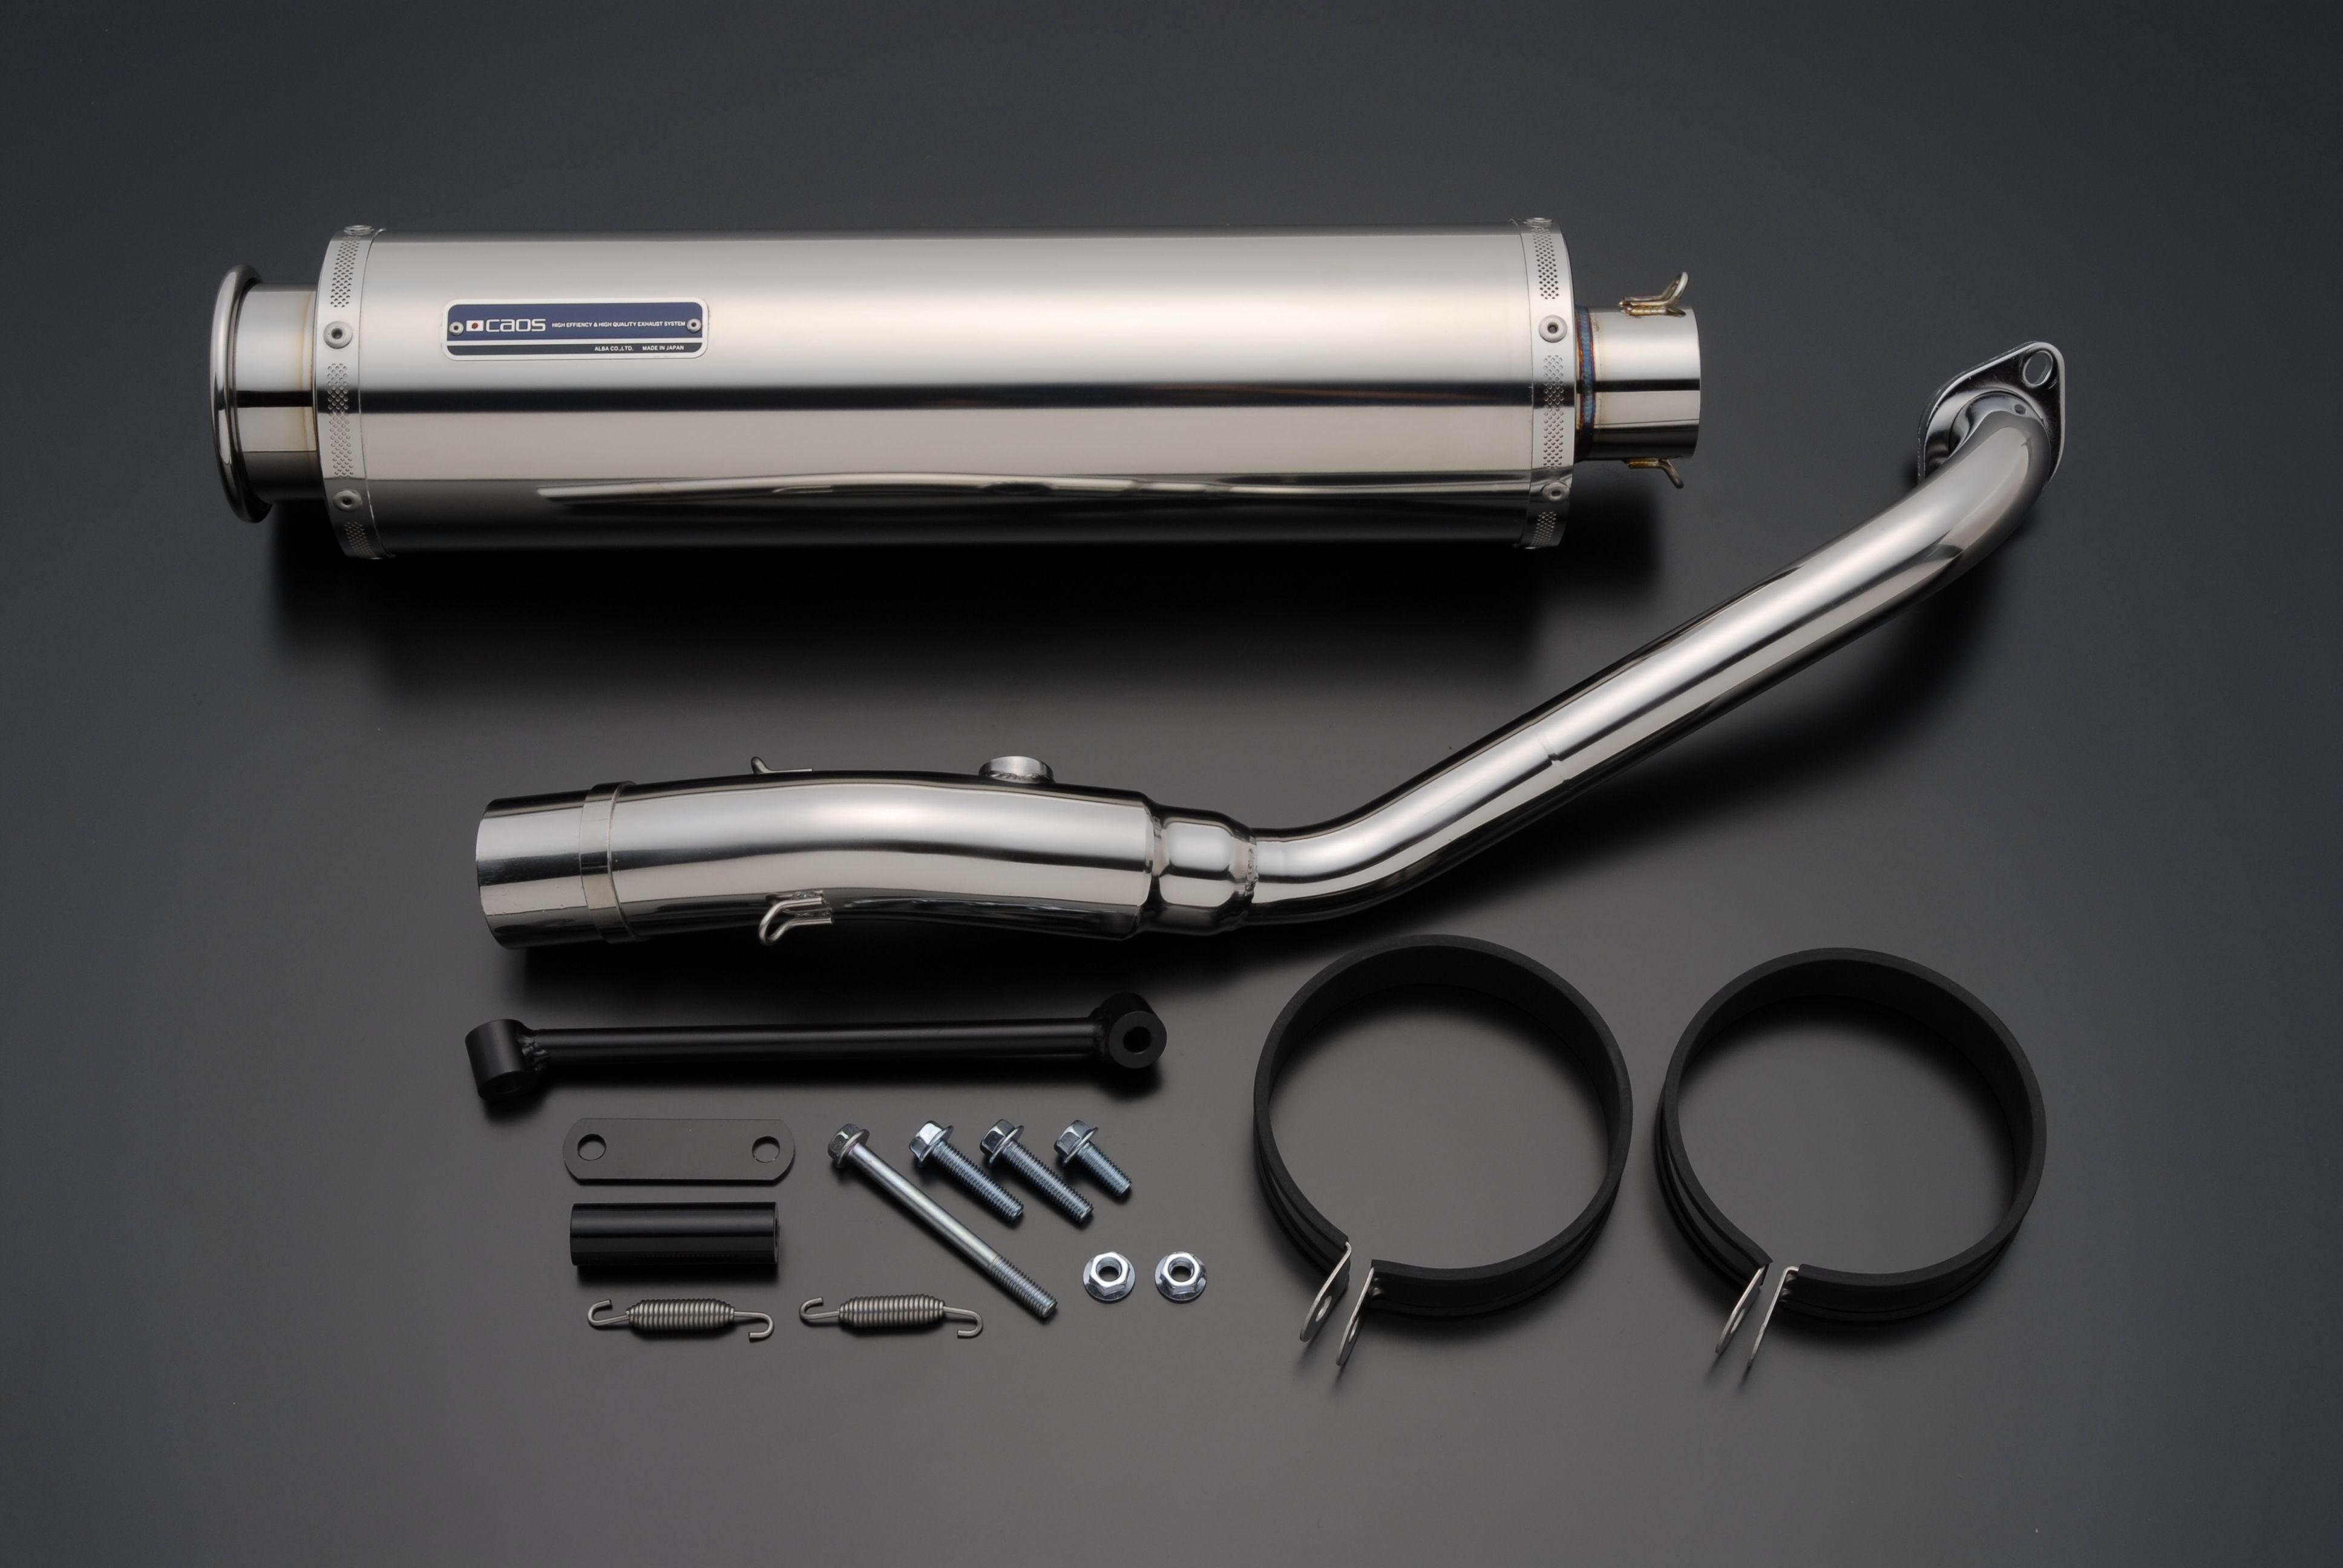 【GRONDEMENT】SPIRAL BEET 4 不銹鋼全段排氣管 - 「Webike-摩托百貨」